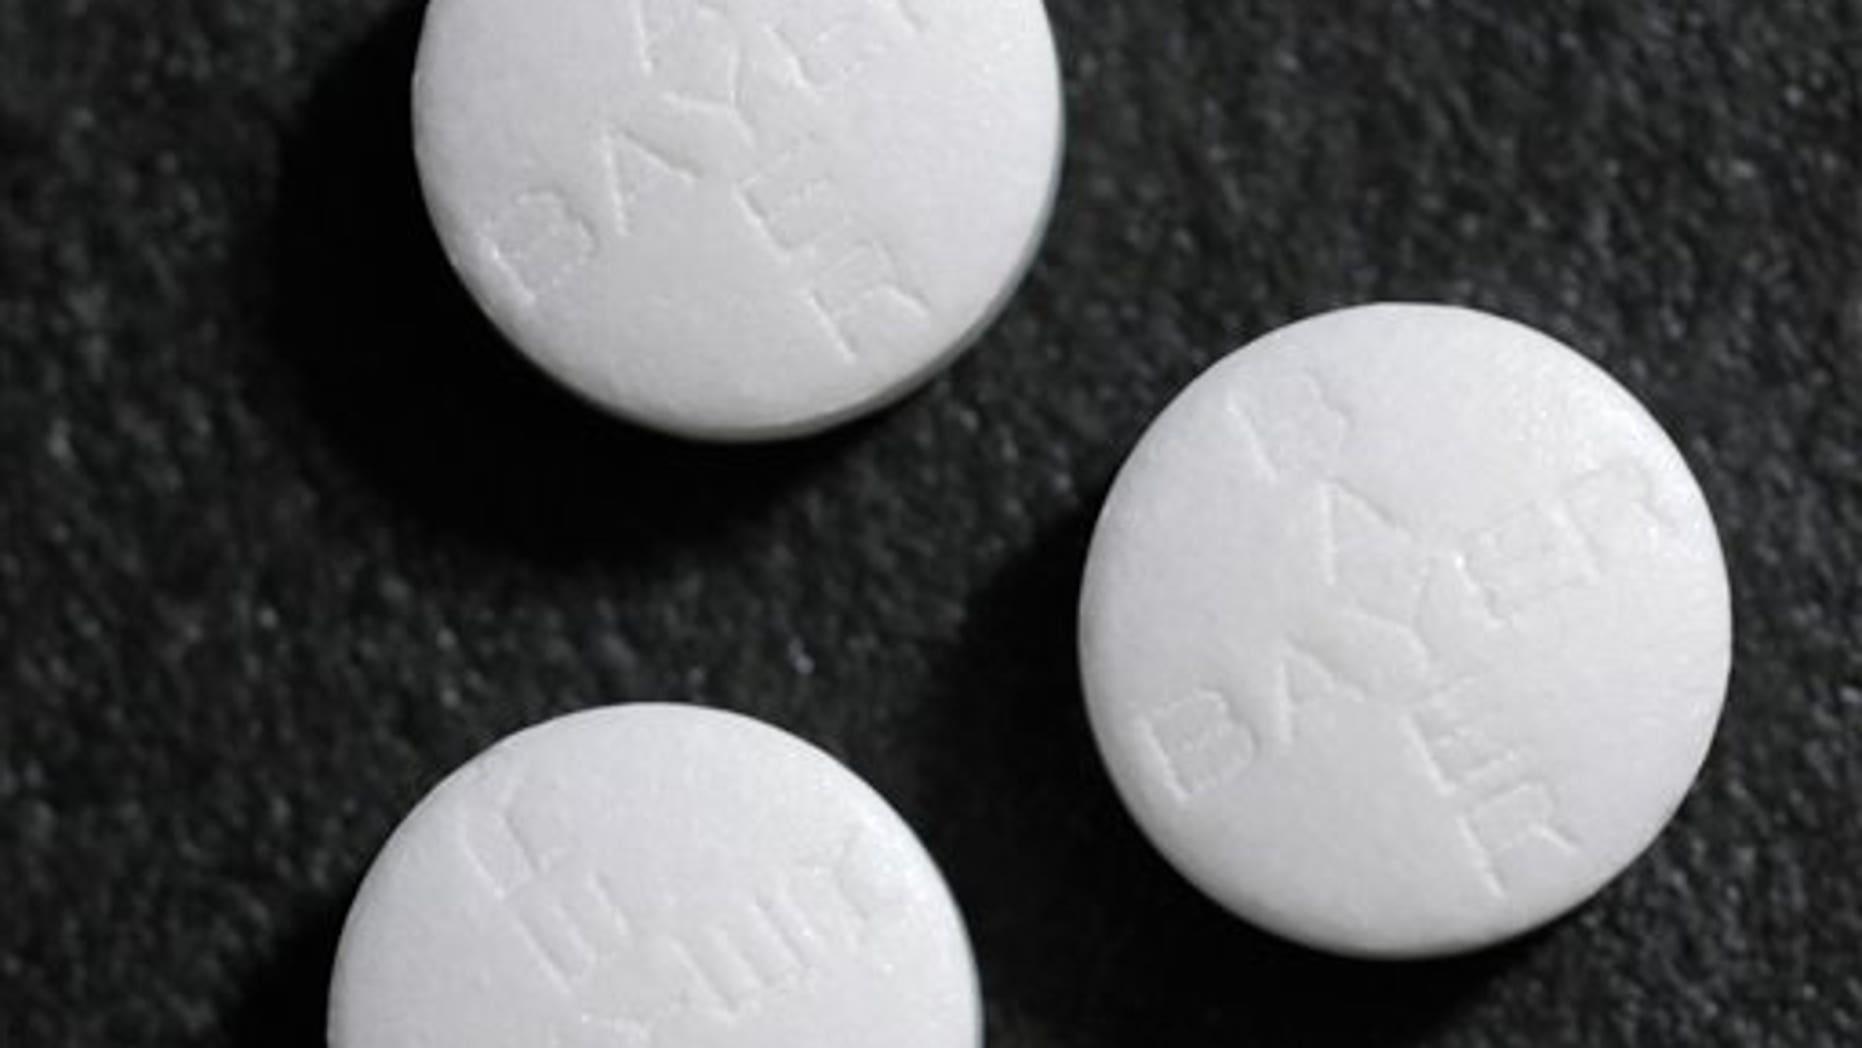 This photo shows aspirin tablets.